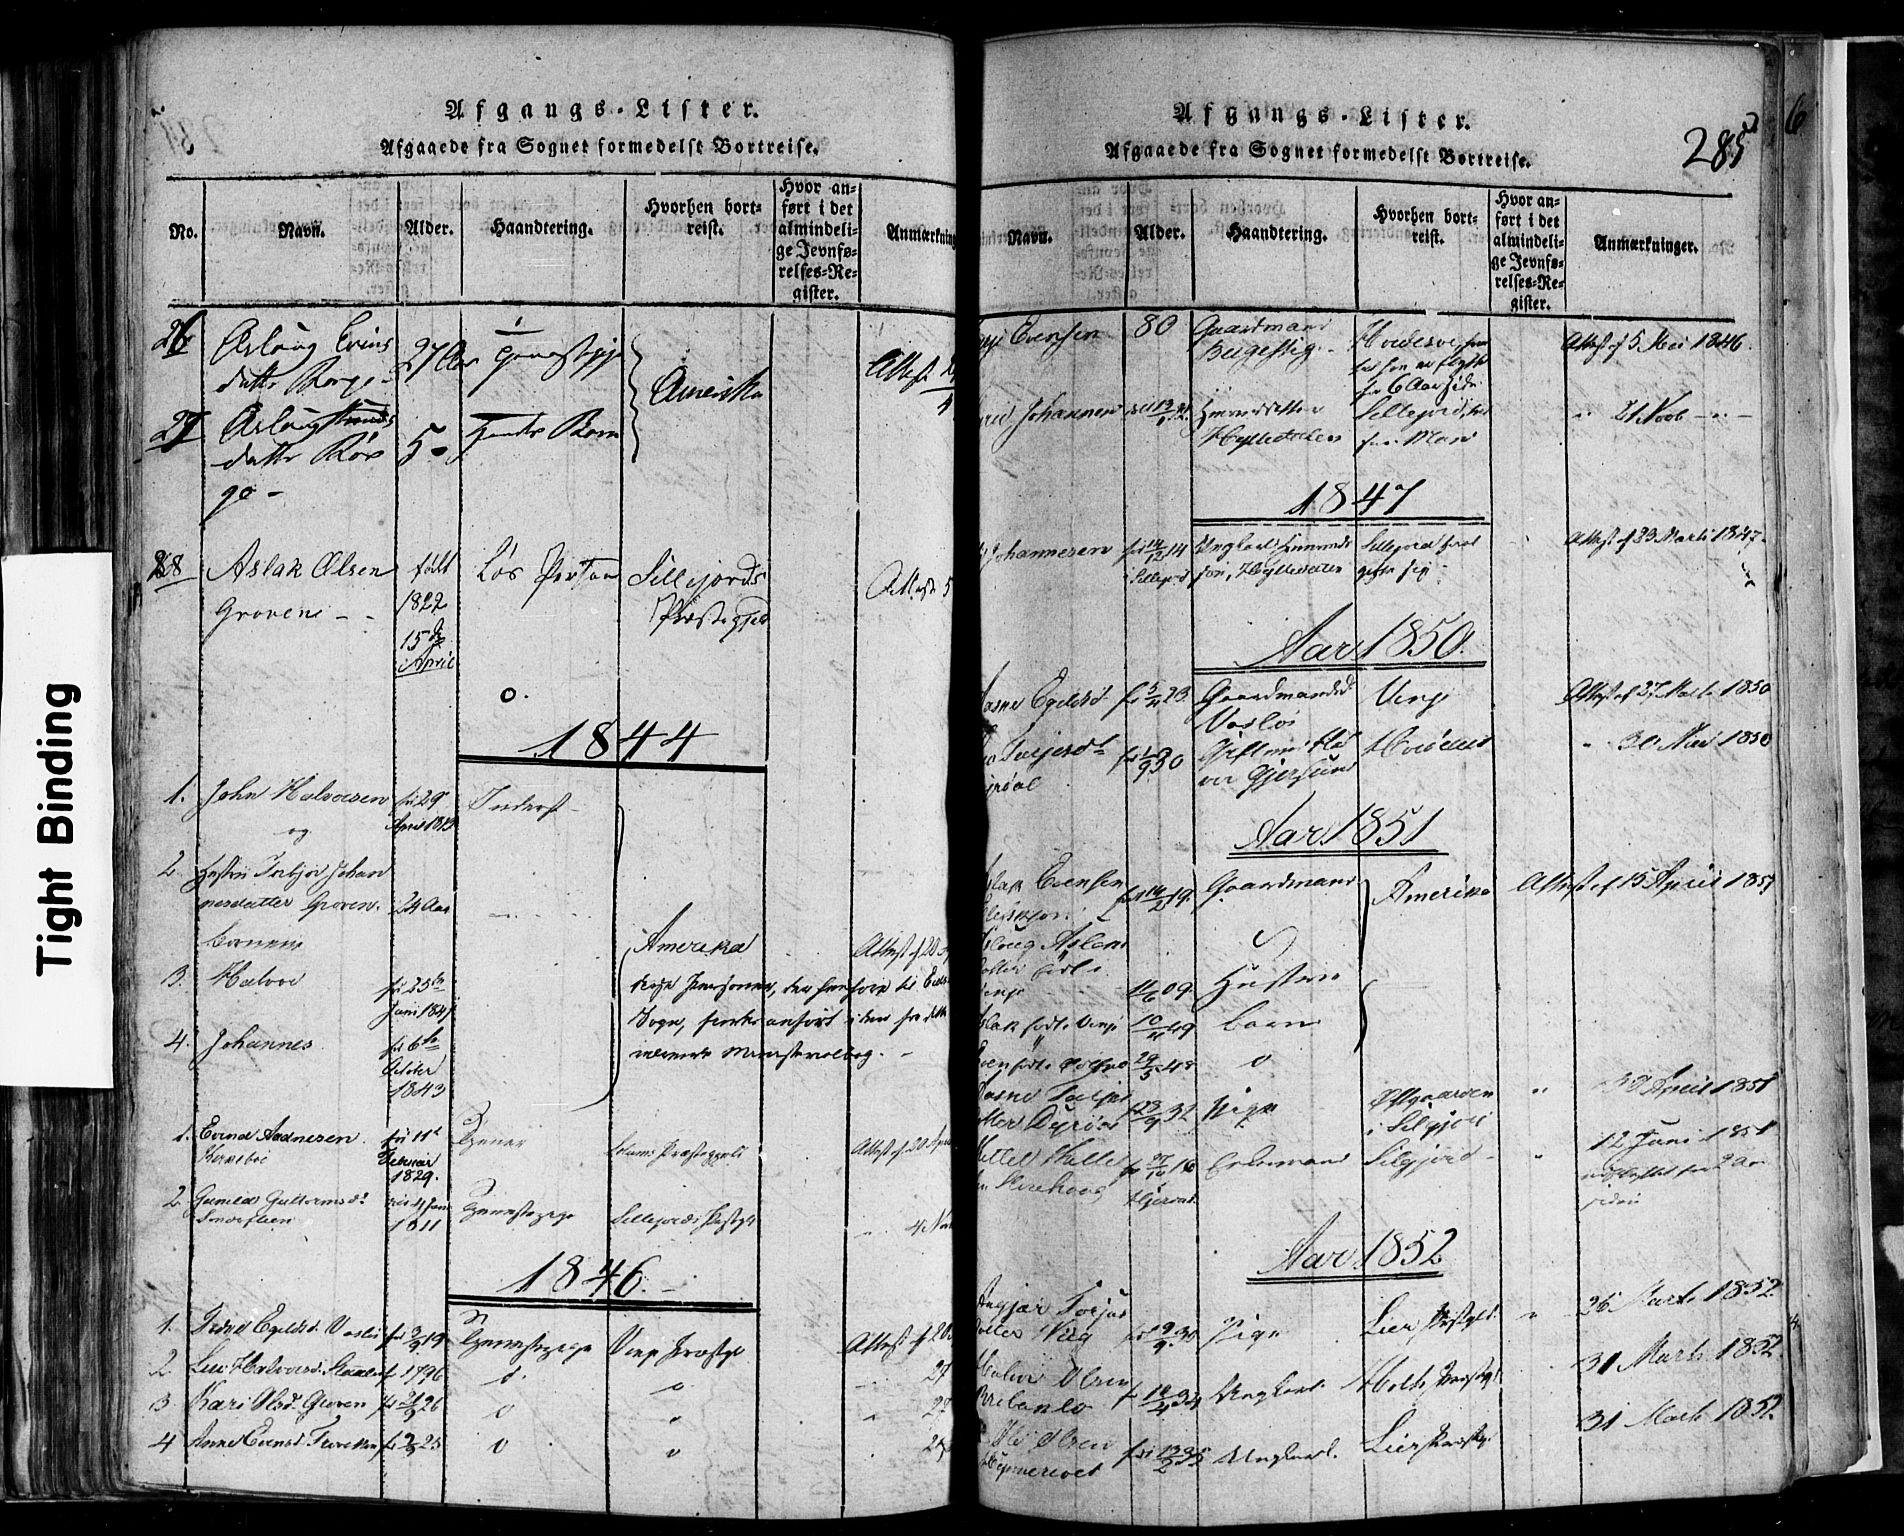 SAKO, Rauland kirkebøker, F/Fa/L0002: Ministerialbok nr. 2, 1815-1860, s. 285